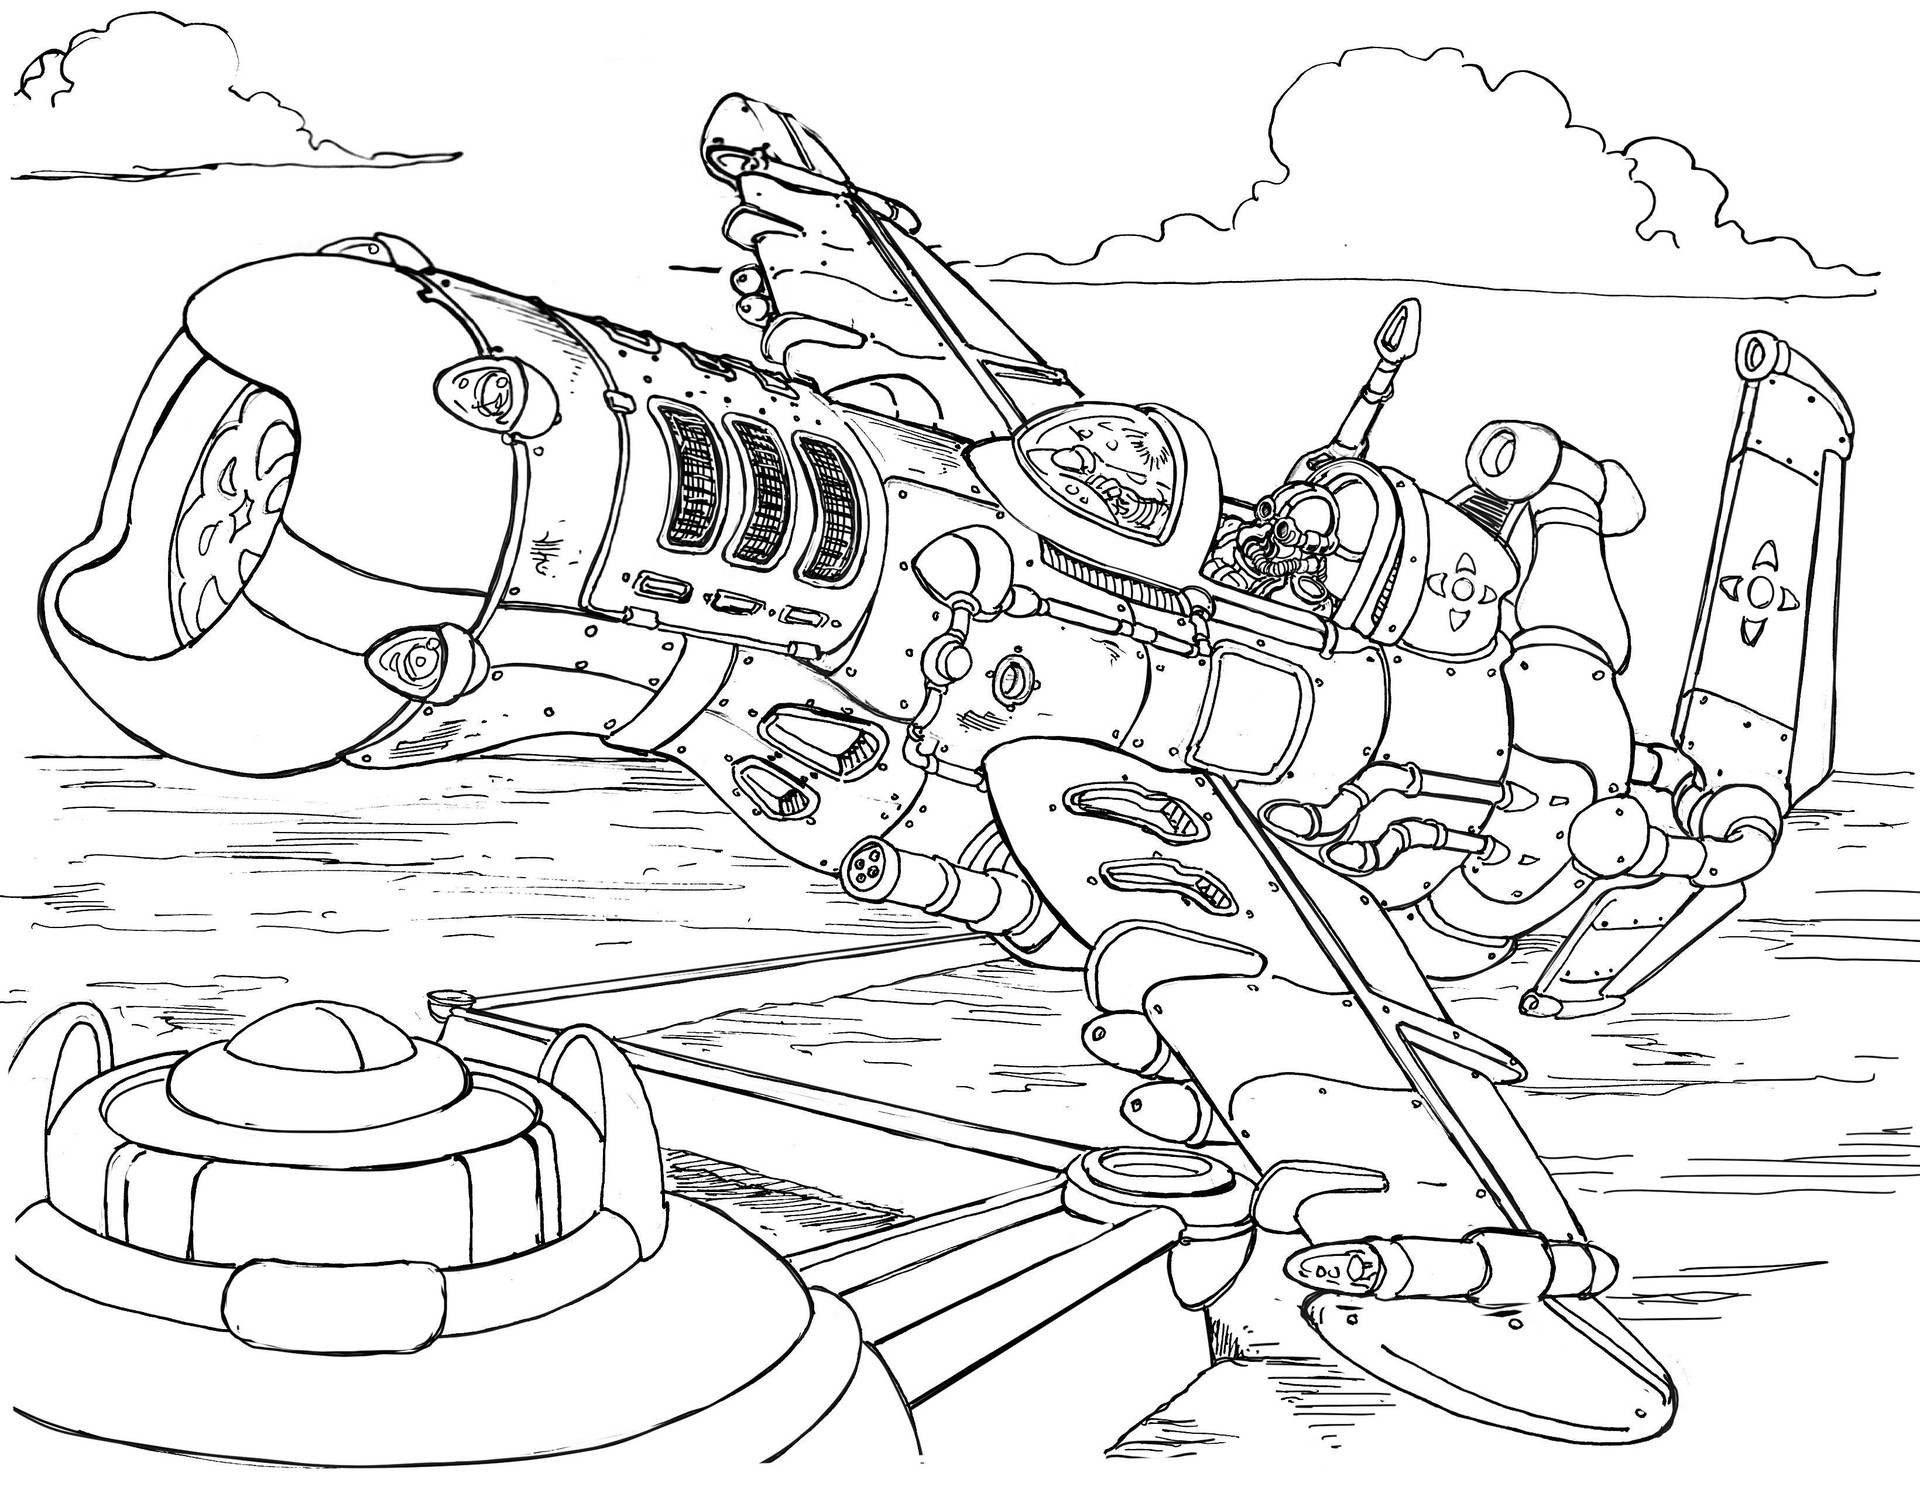 Vincent bryant attack plane 03